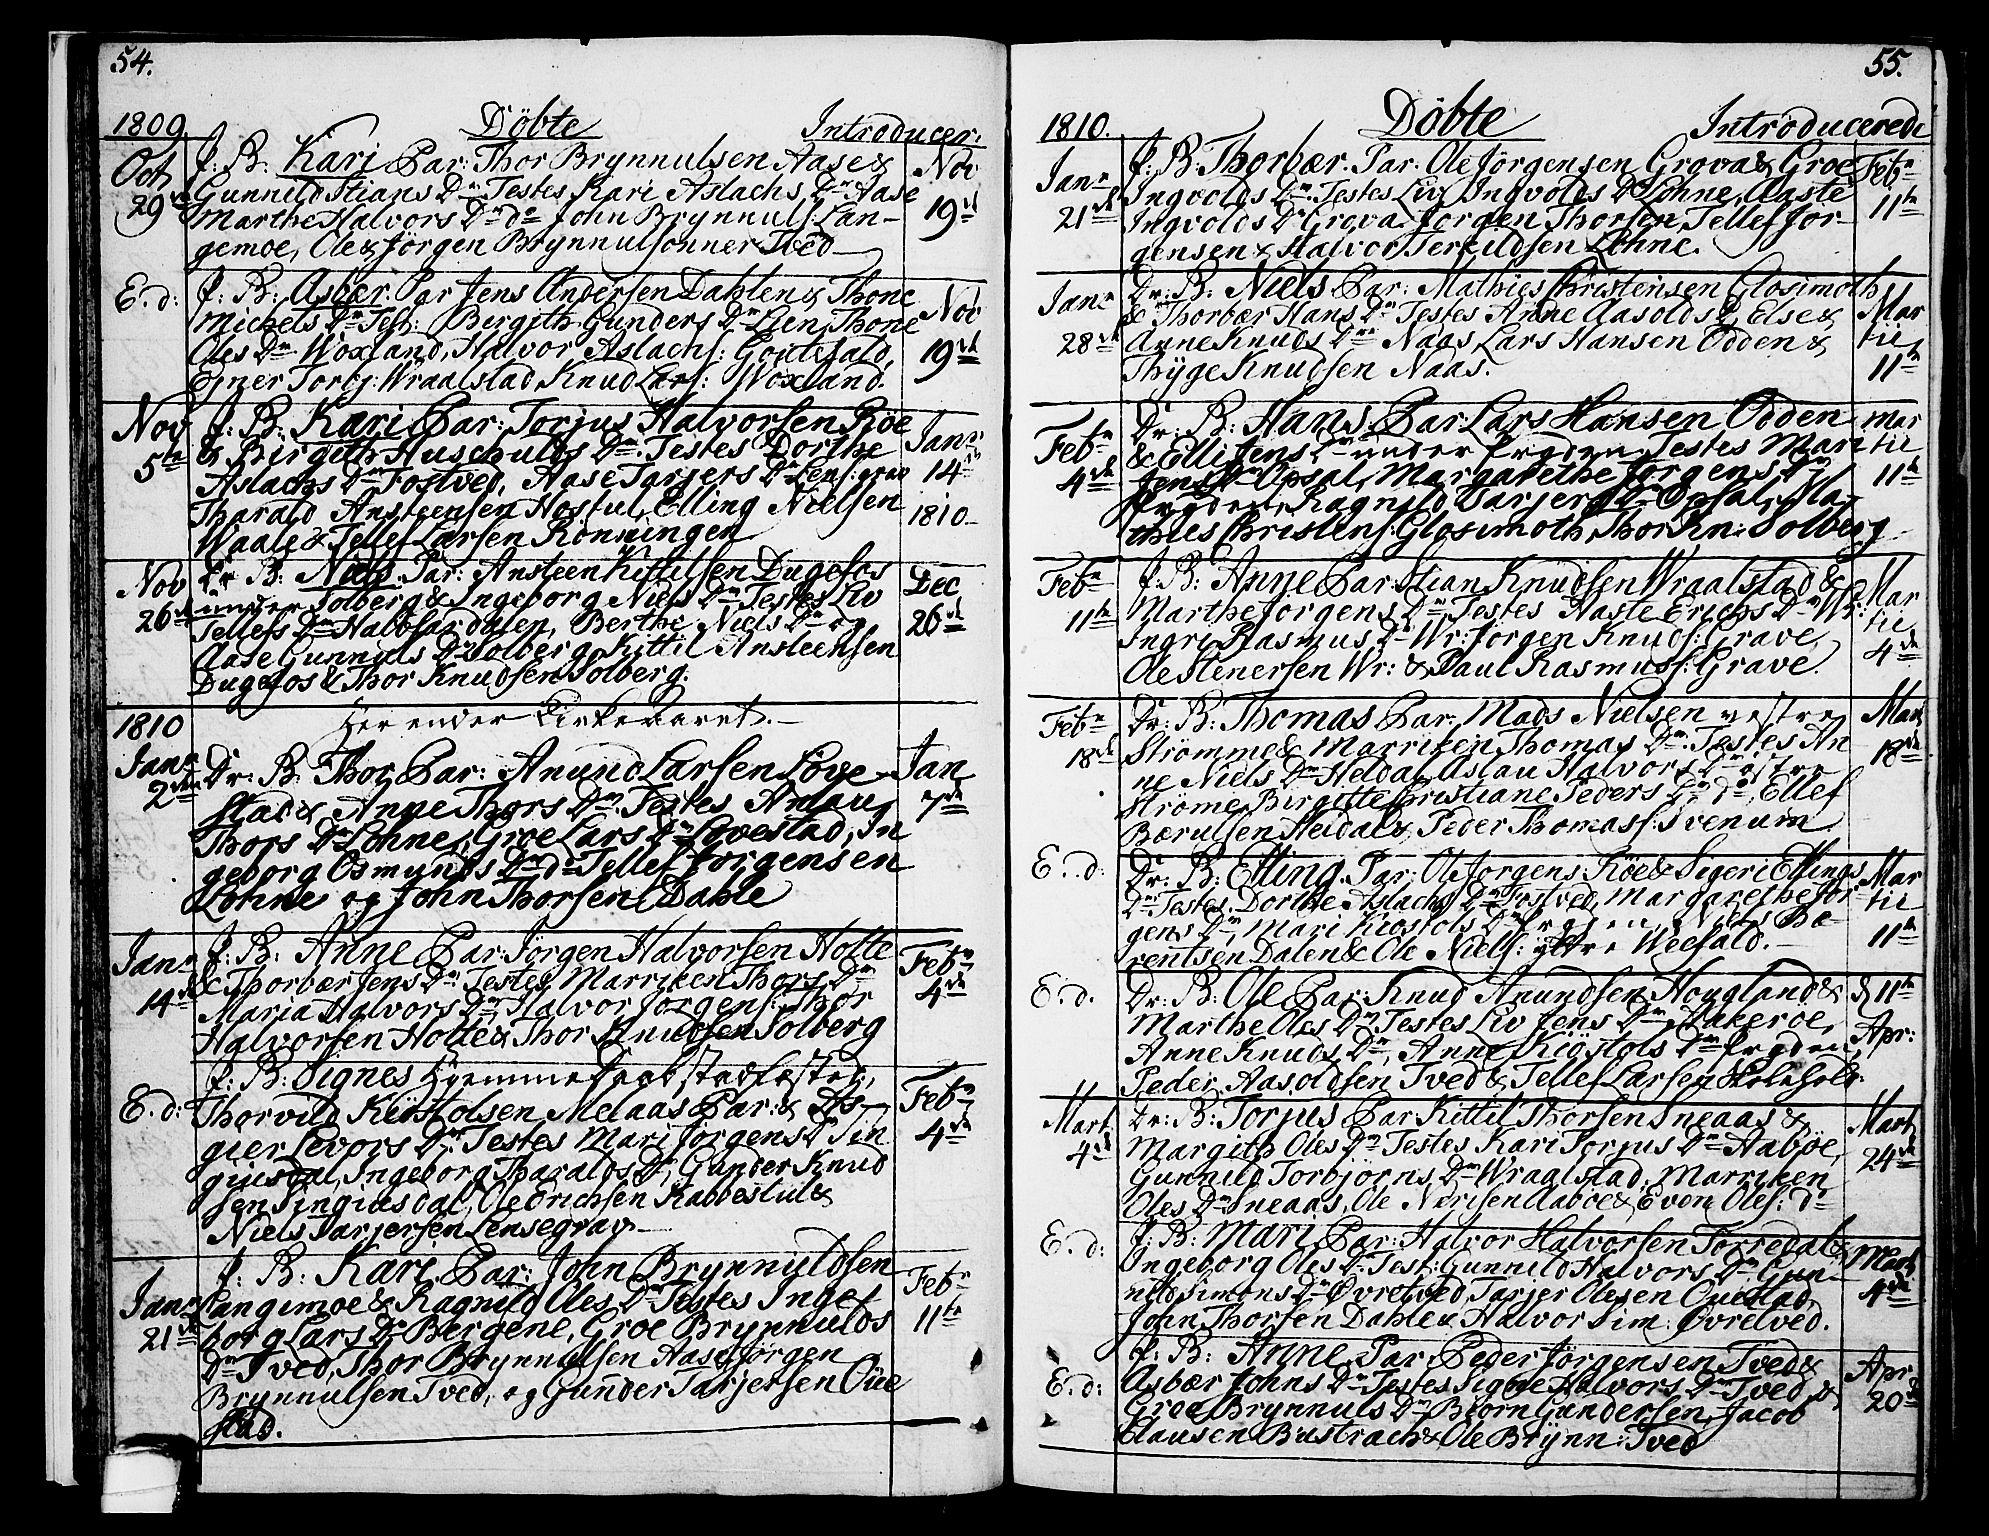 SAKO, Drangedal kirkebøker, F/Fa/L0004: Ministerialbok nr. 4, 1802-1814, s. 54-55